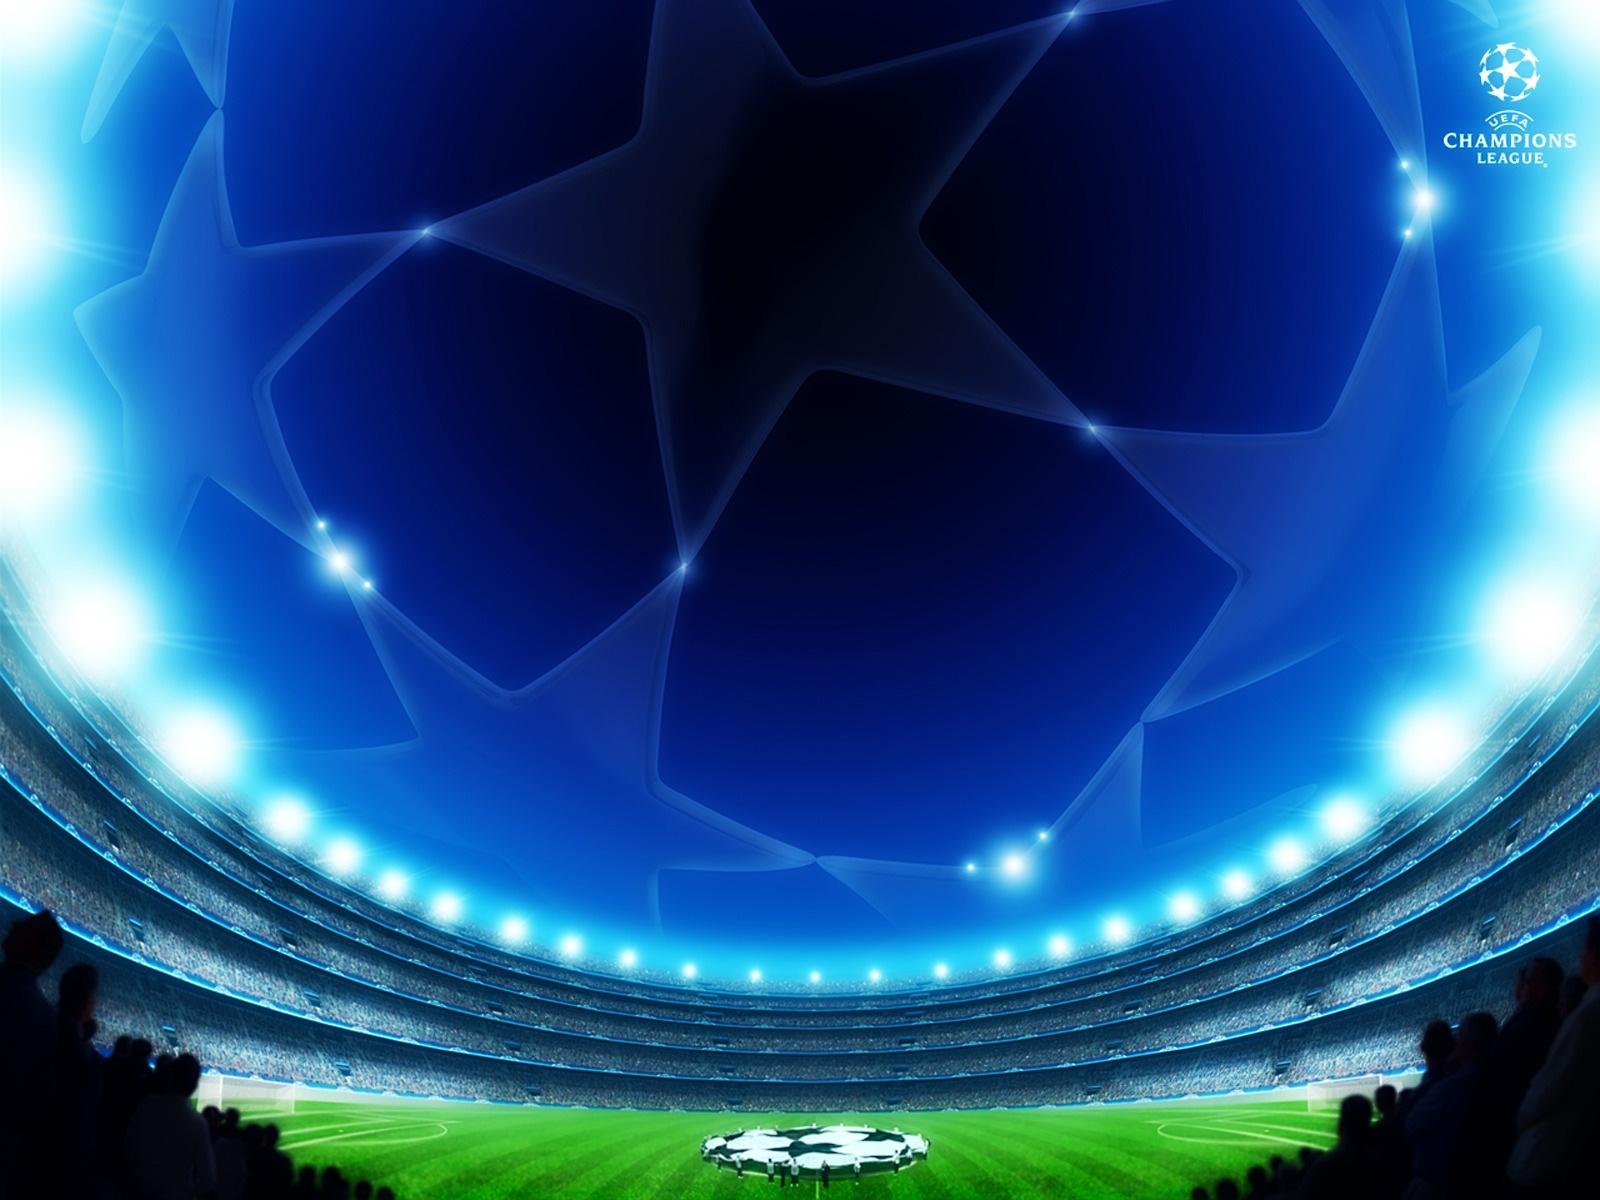 http://2.bp.blogspot.com/_mRMAp5mdZ5A/TQ1cJyxnYLI/AAAAAAAAAB0/Y-obdnua3H0/s1600/uefa_champions_league.jpg